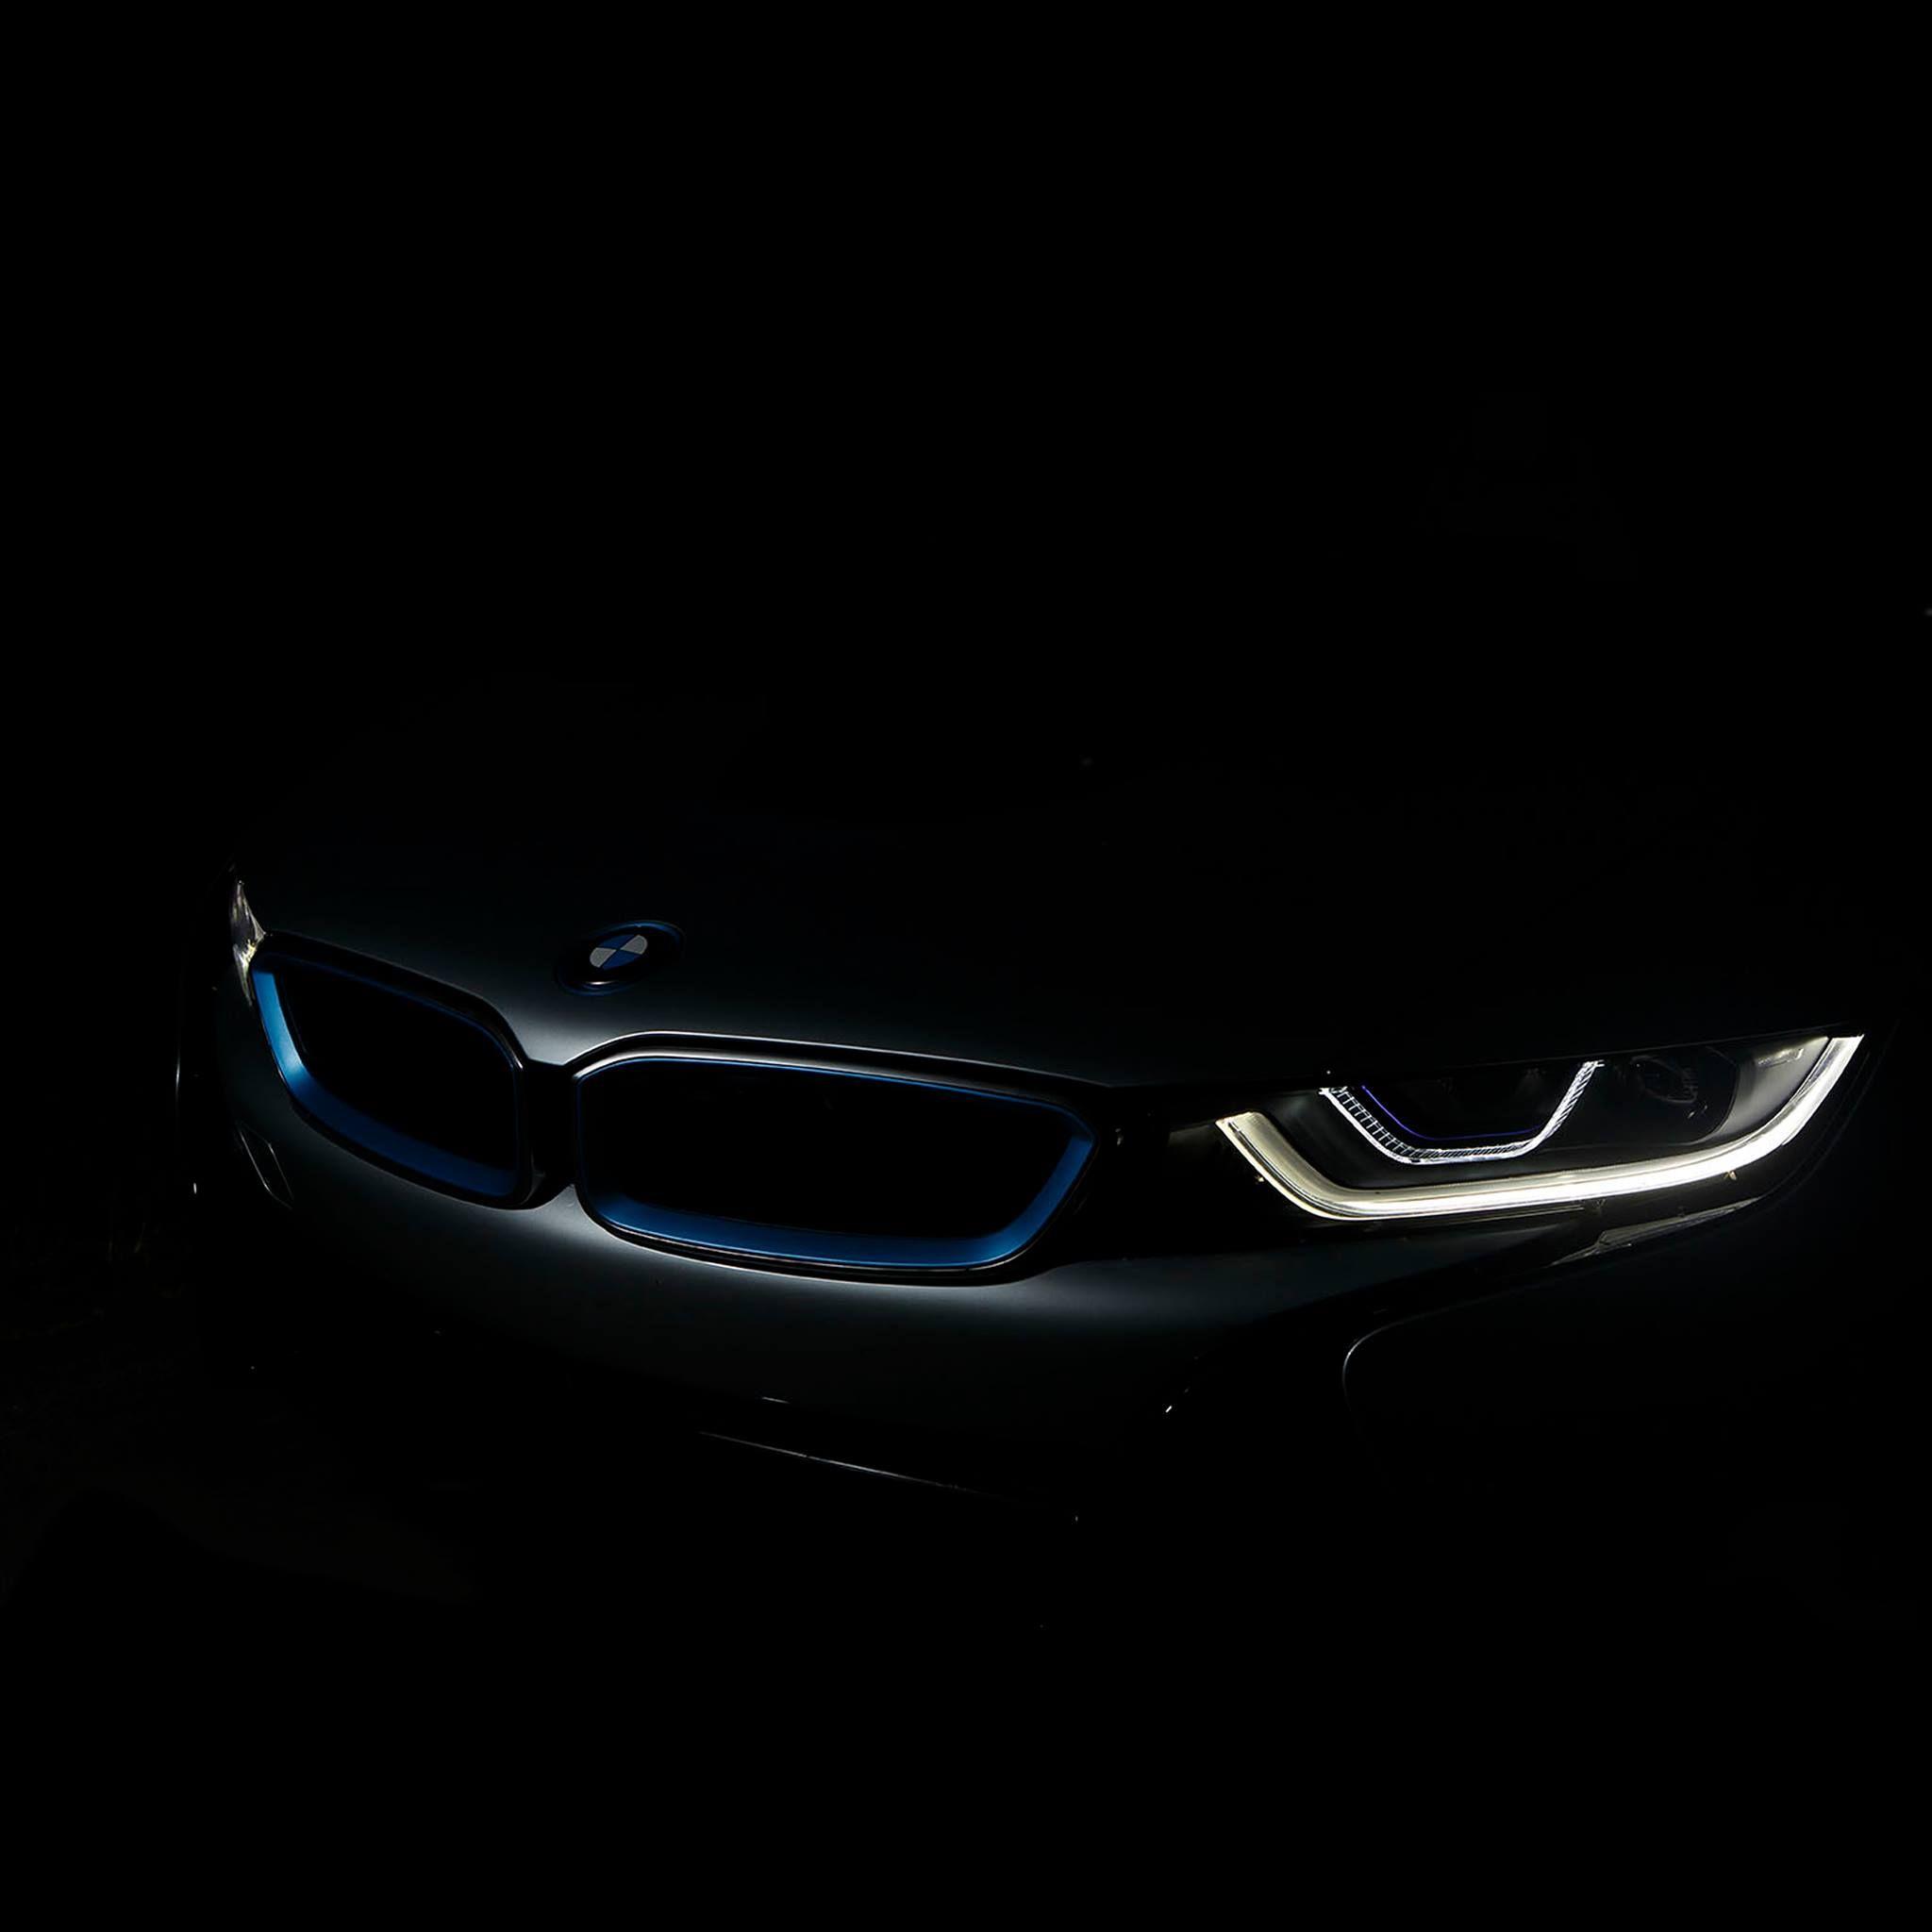 Bmw Laser Headlights Bmw Wallpapers Bmw Cars Luxury Cars